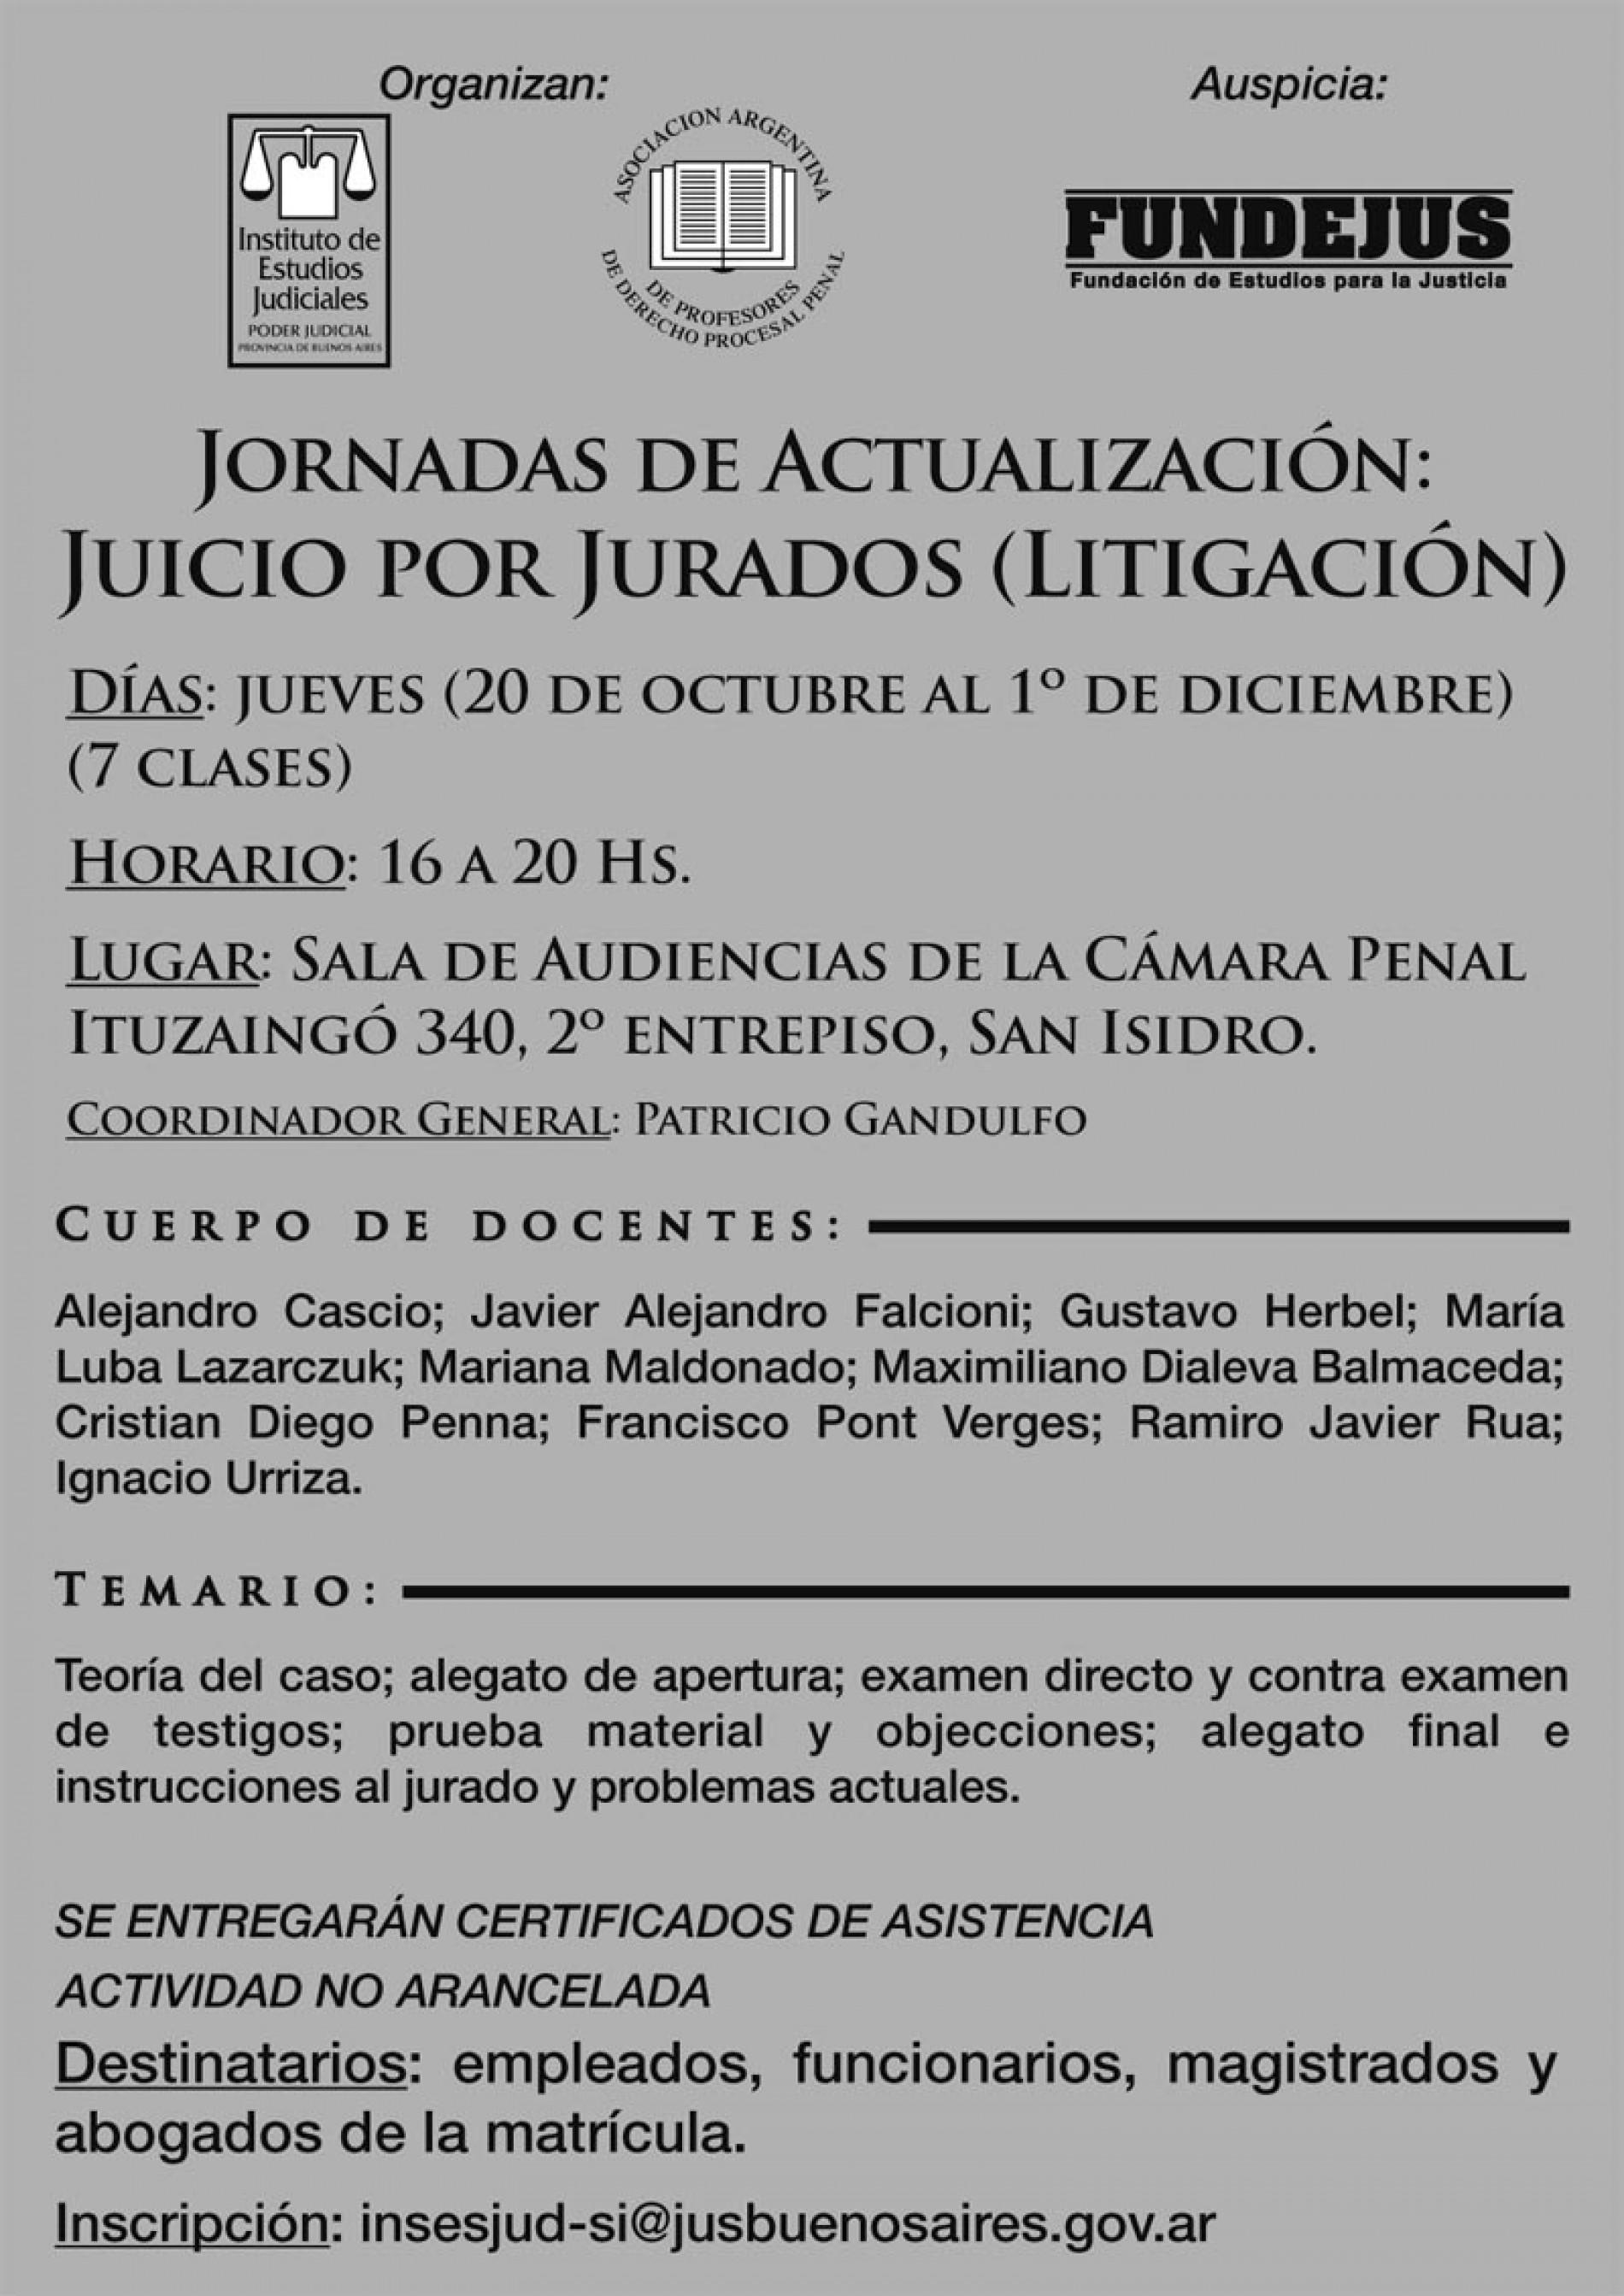 Juicio por Jurados » litigación «